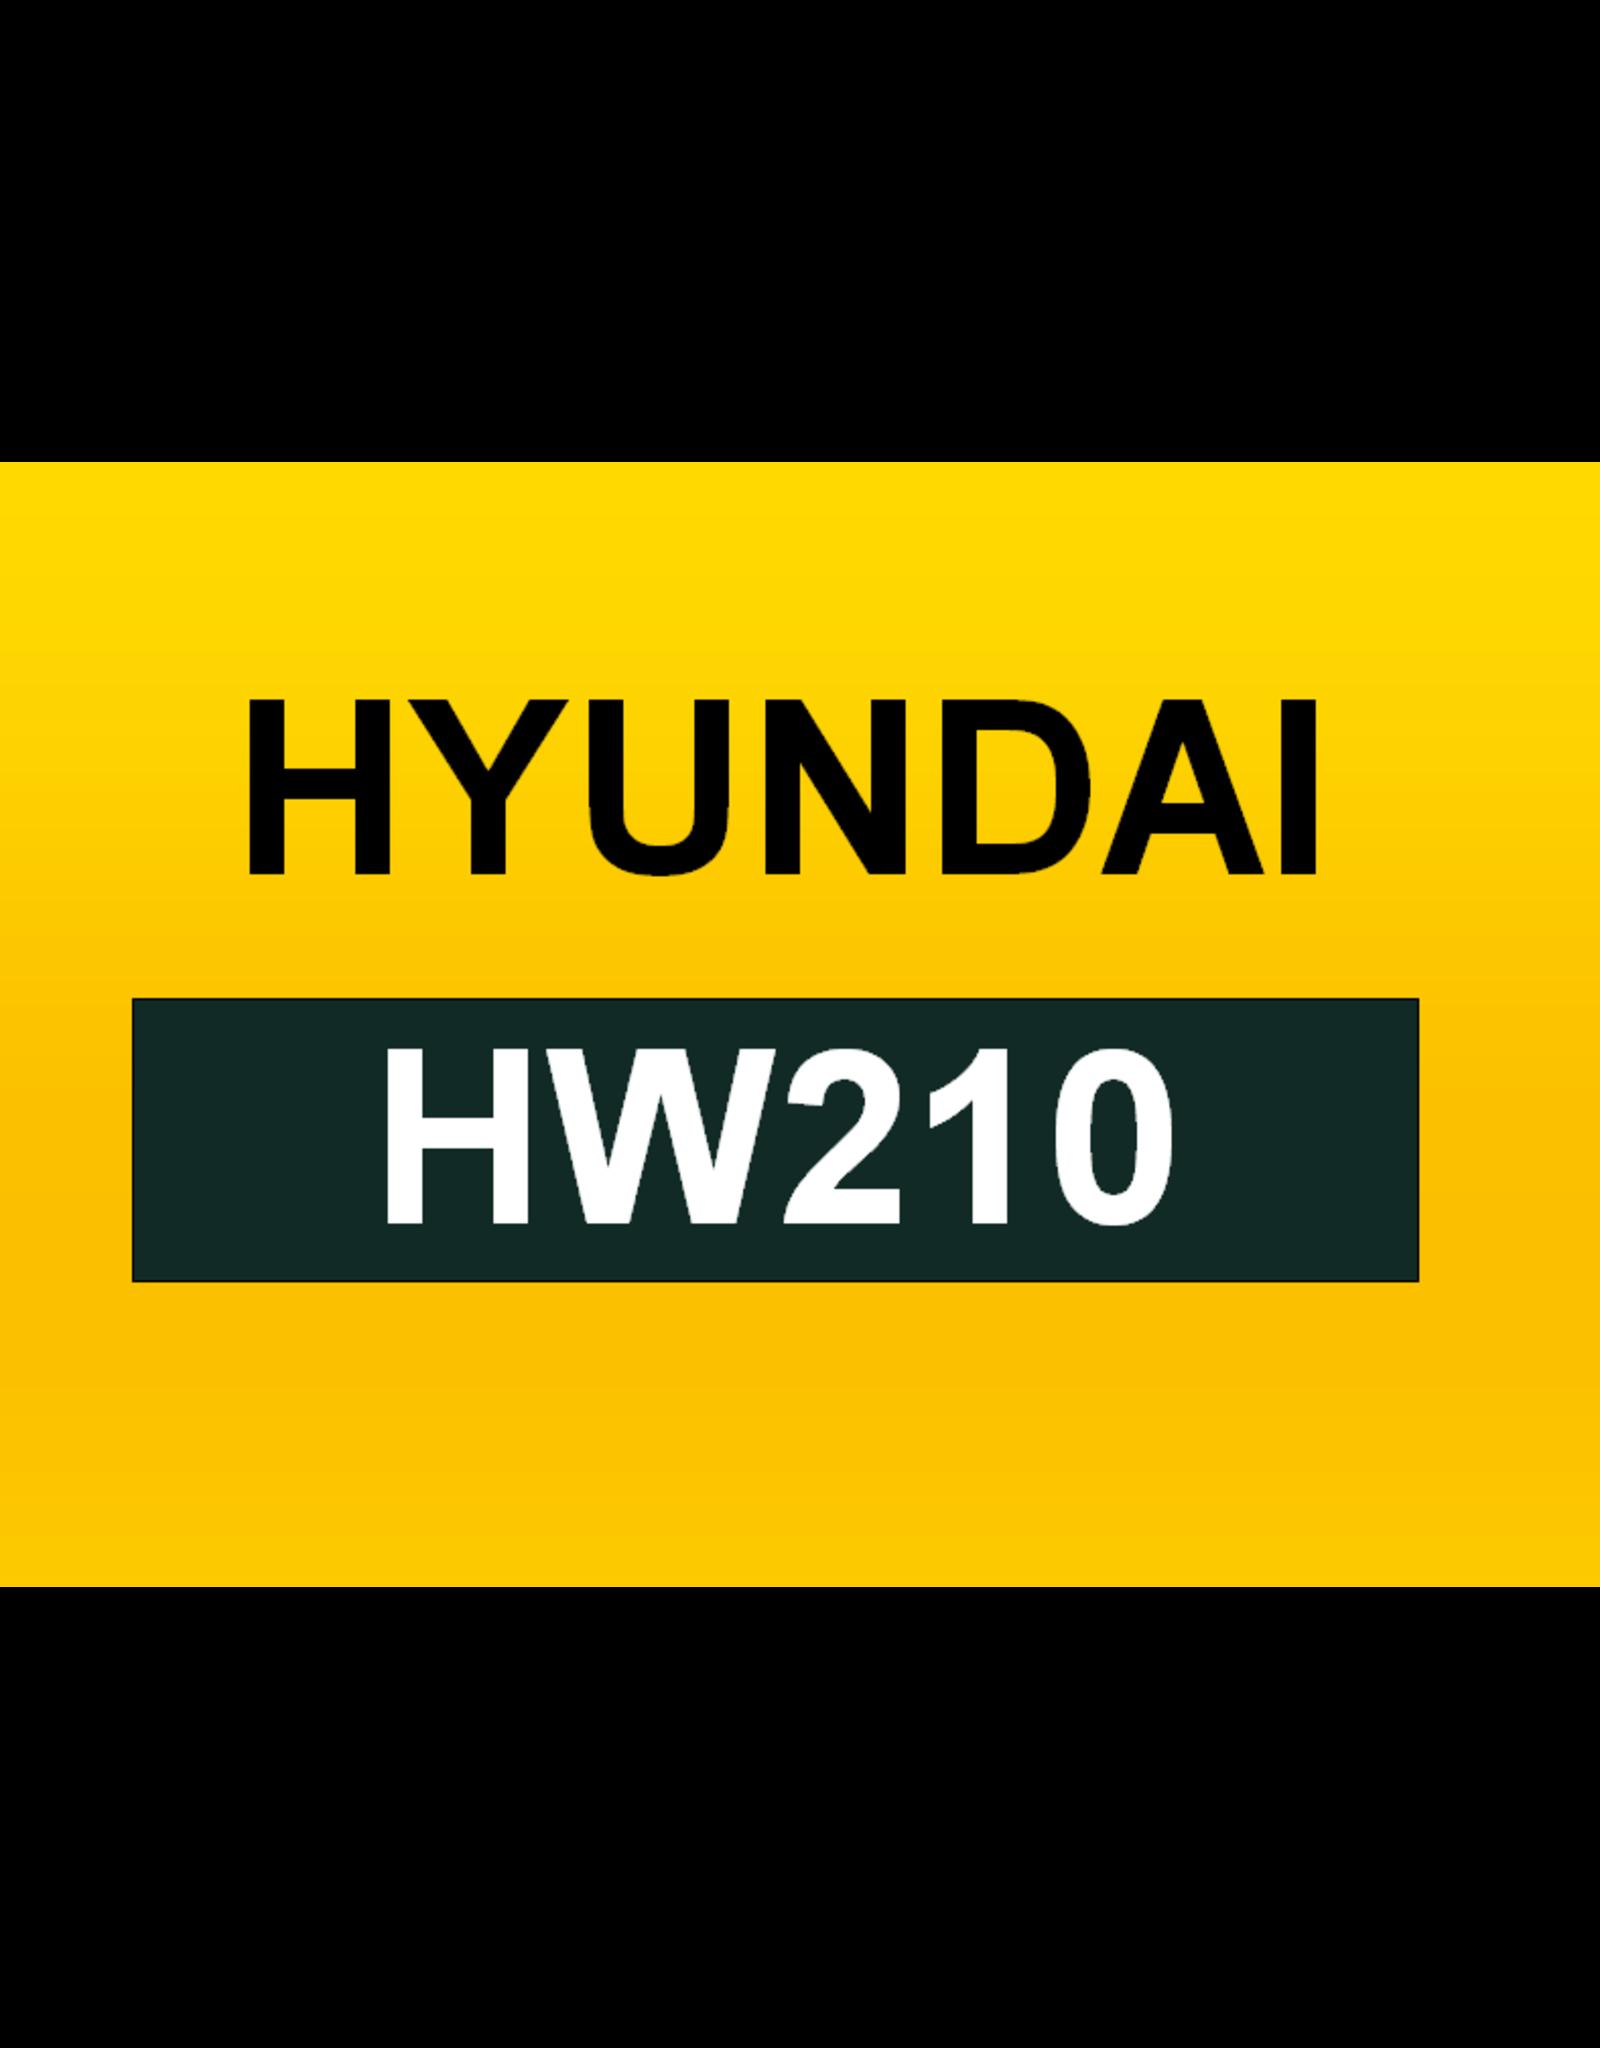 Echle Hartstahl GmbH FOPS for Hyundai HW210